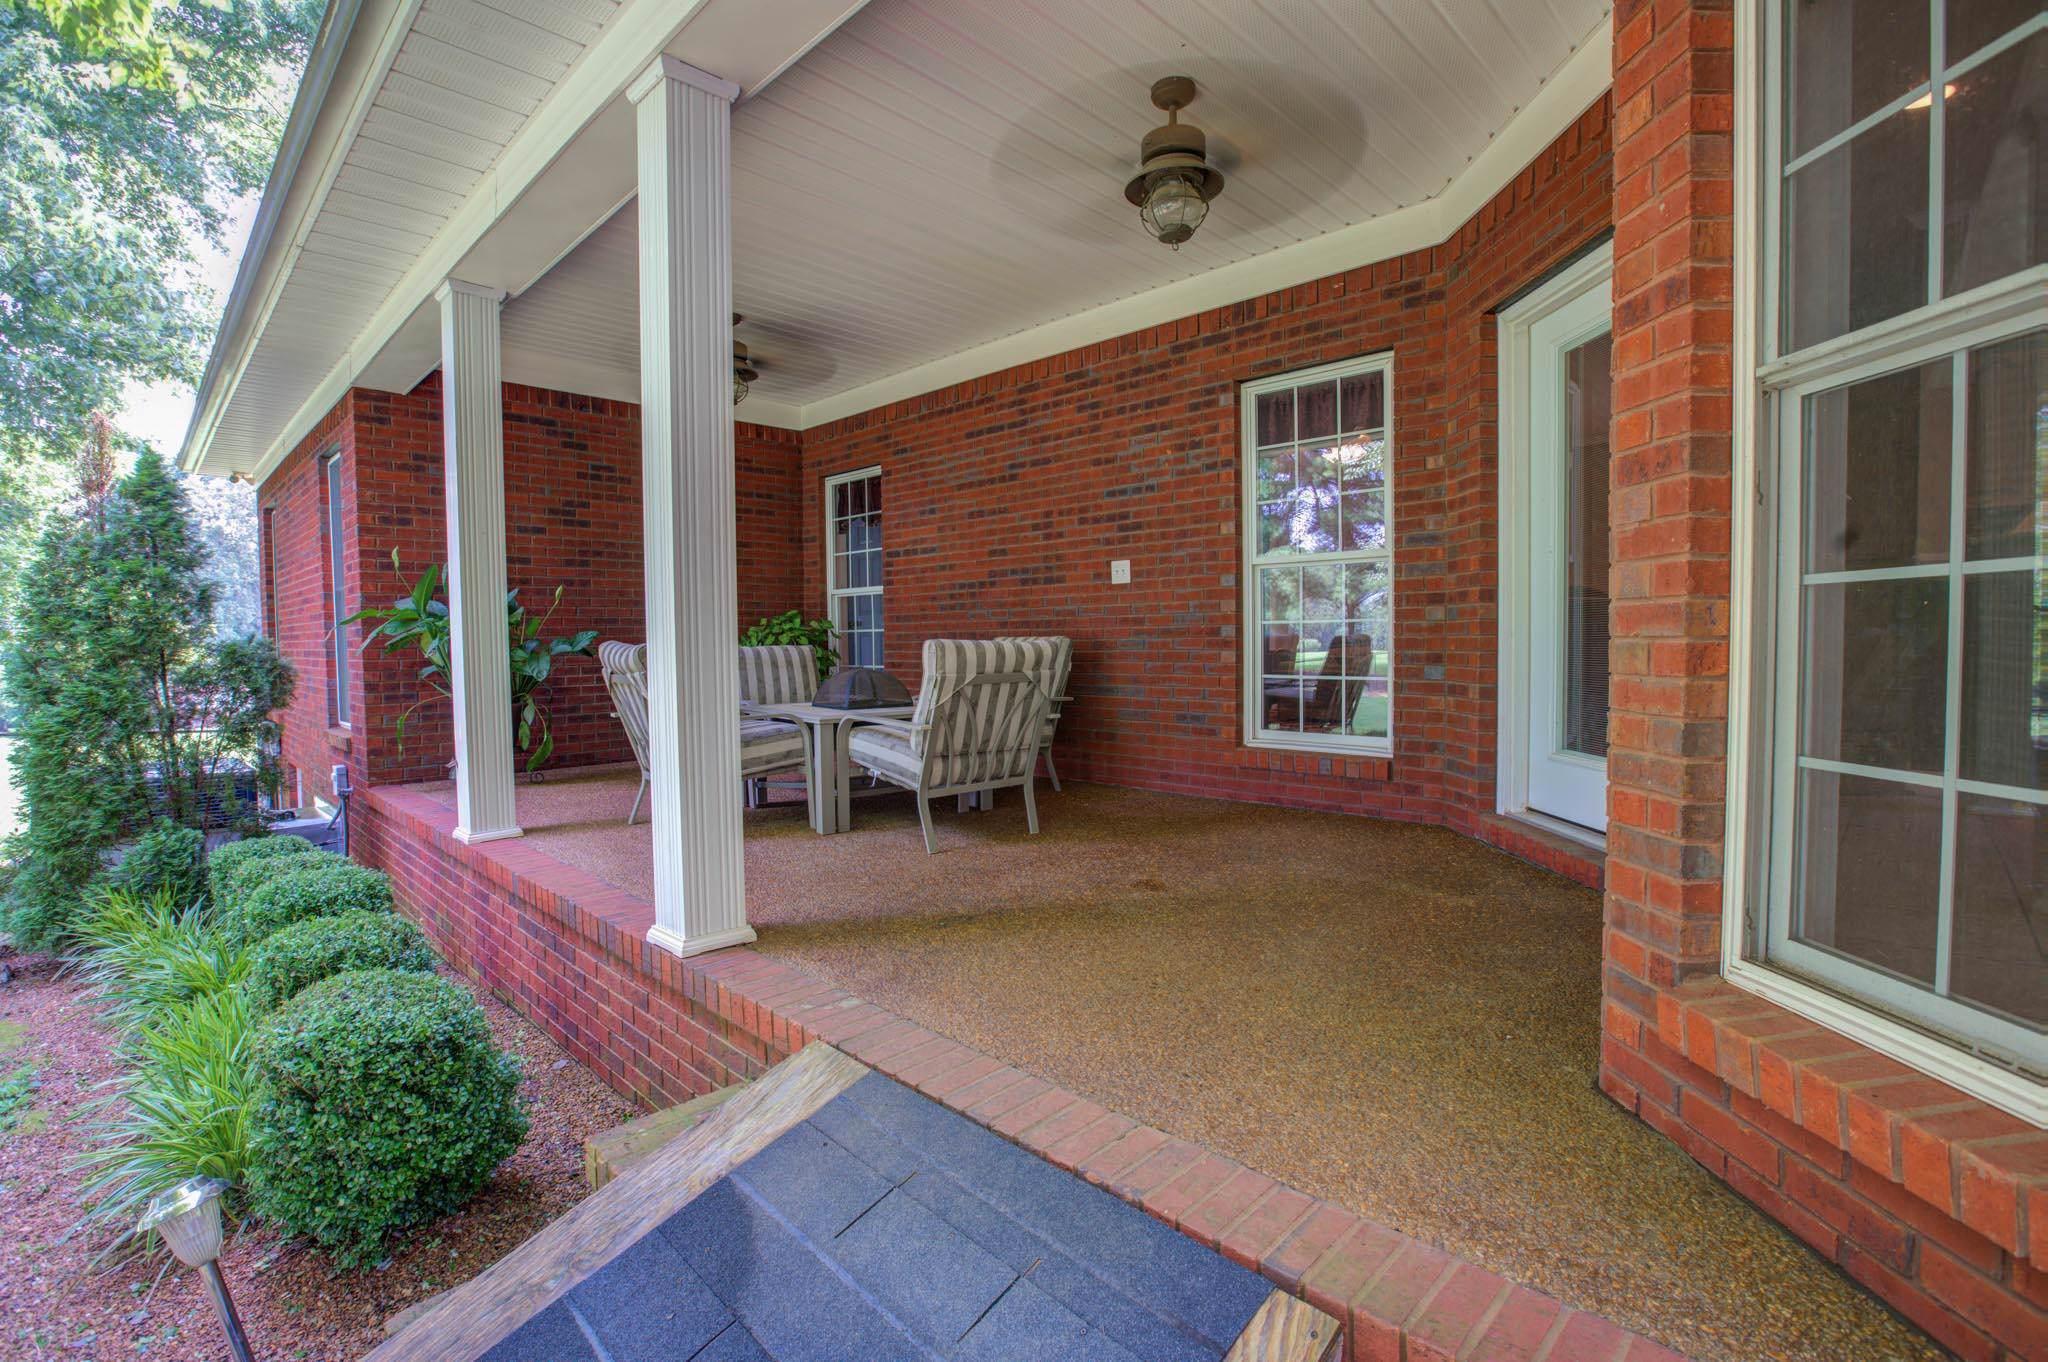 196 Walden Rd, Lawrenceburg, TN 38464 (MLS #RTC2063988) :: REMAX Elite